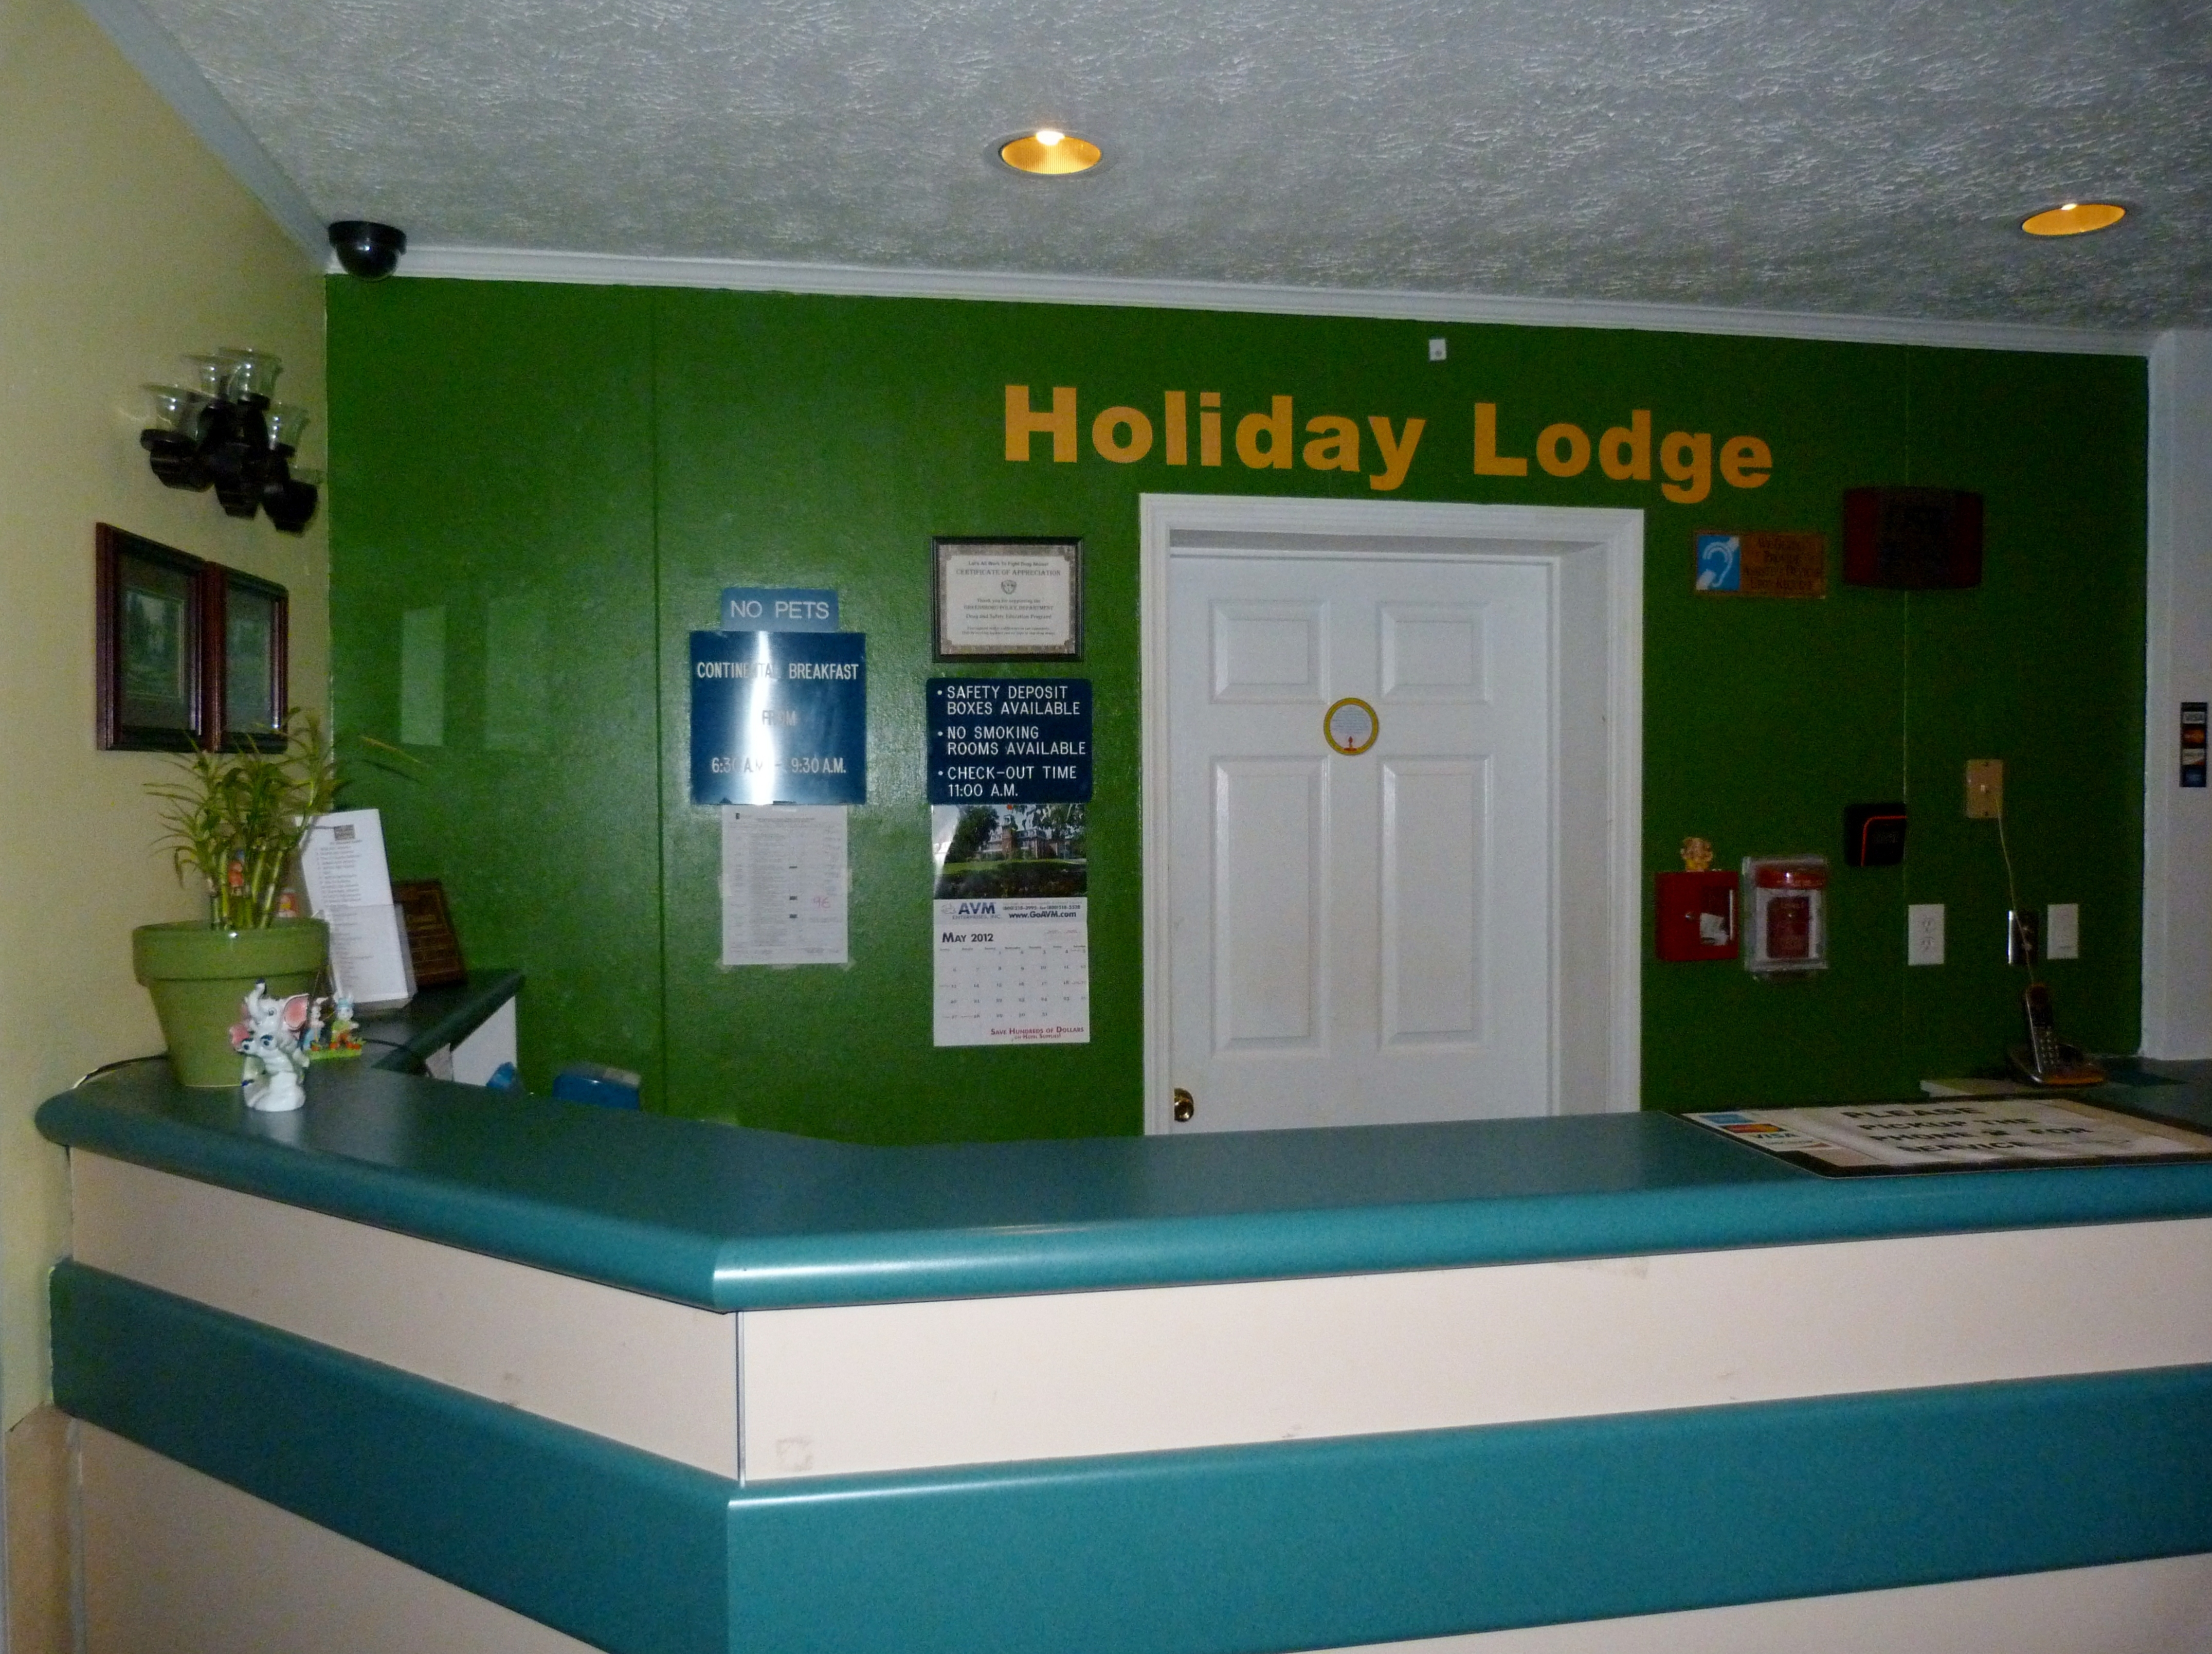 Holiday Lodge image 1